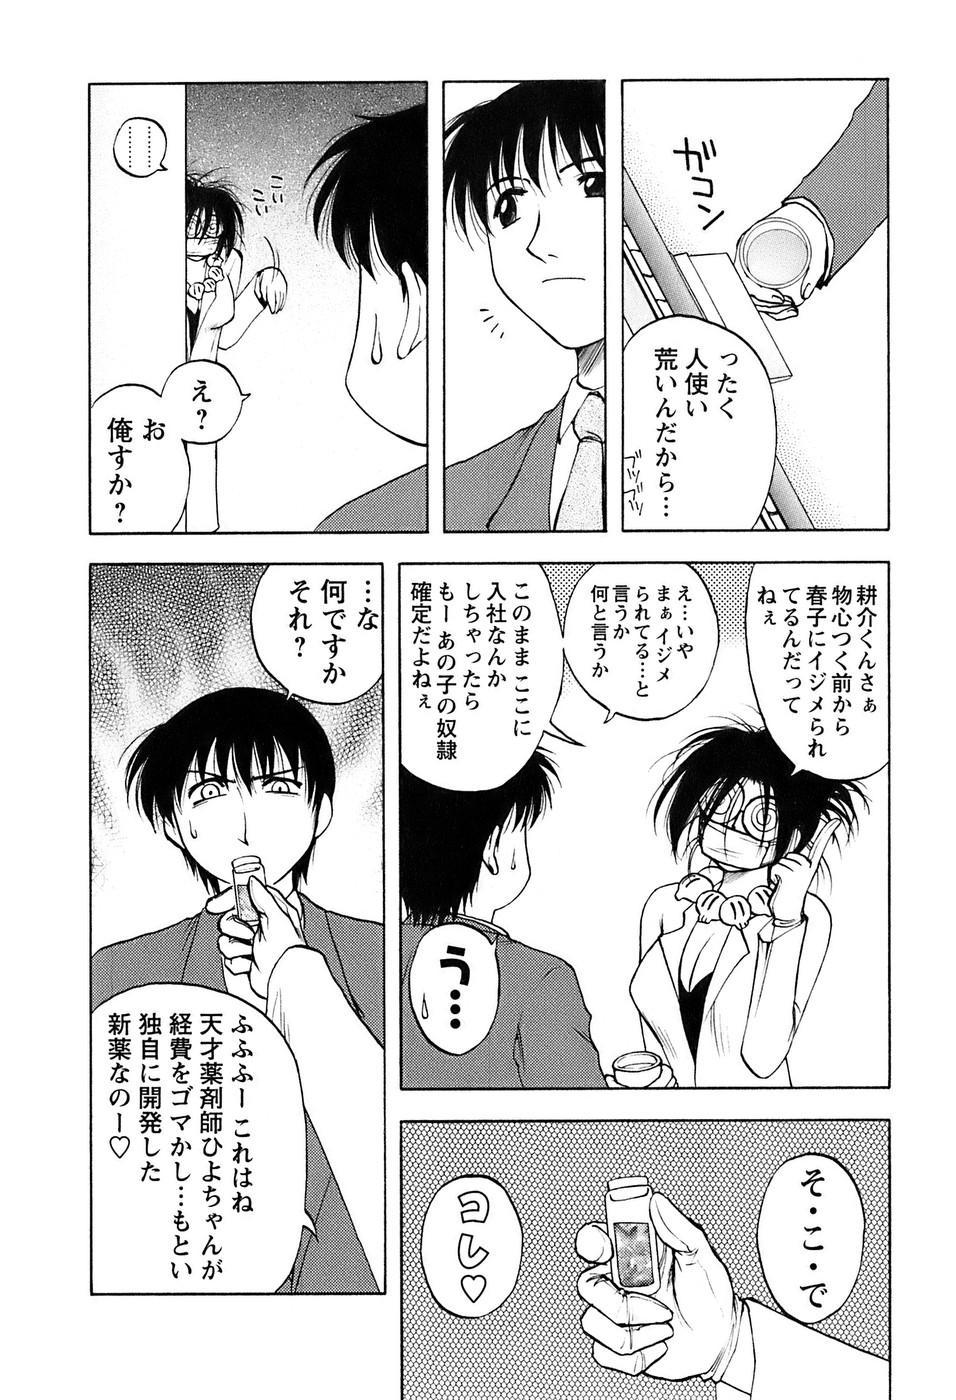 Okusan Volley - Madam Volleyball 164